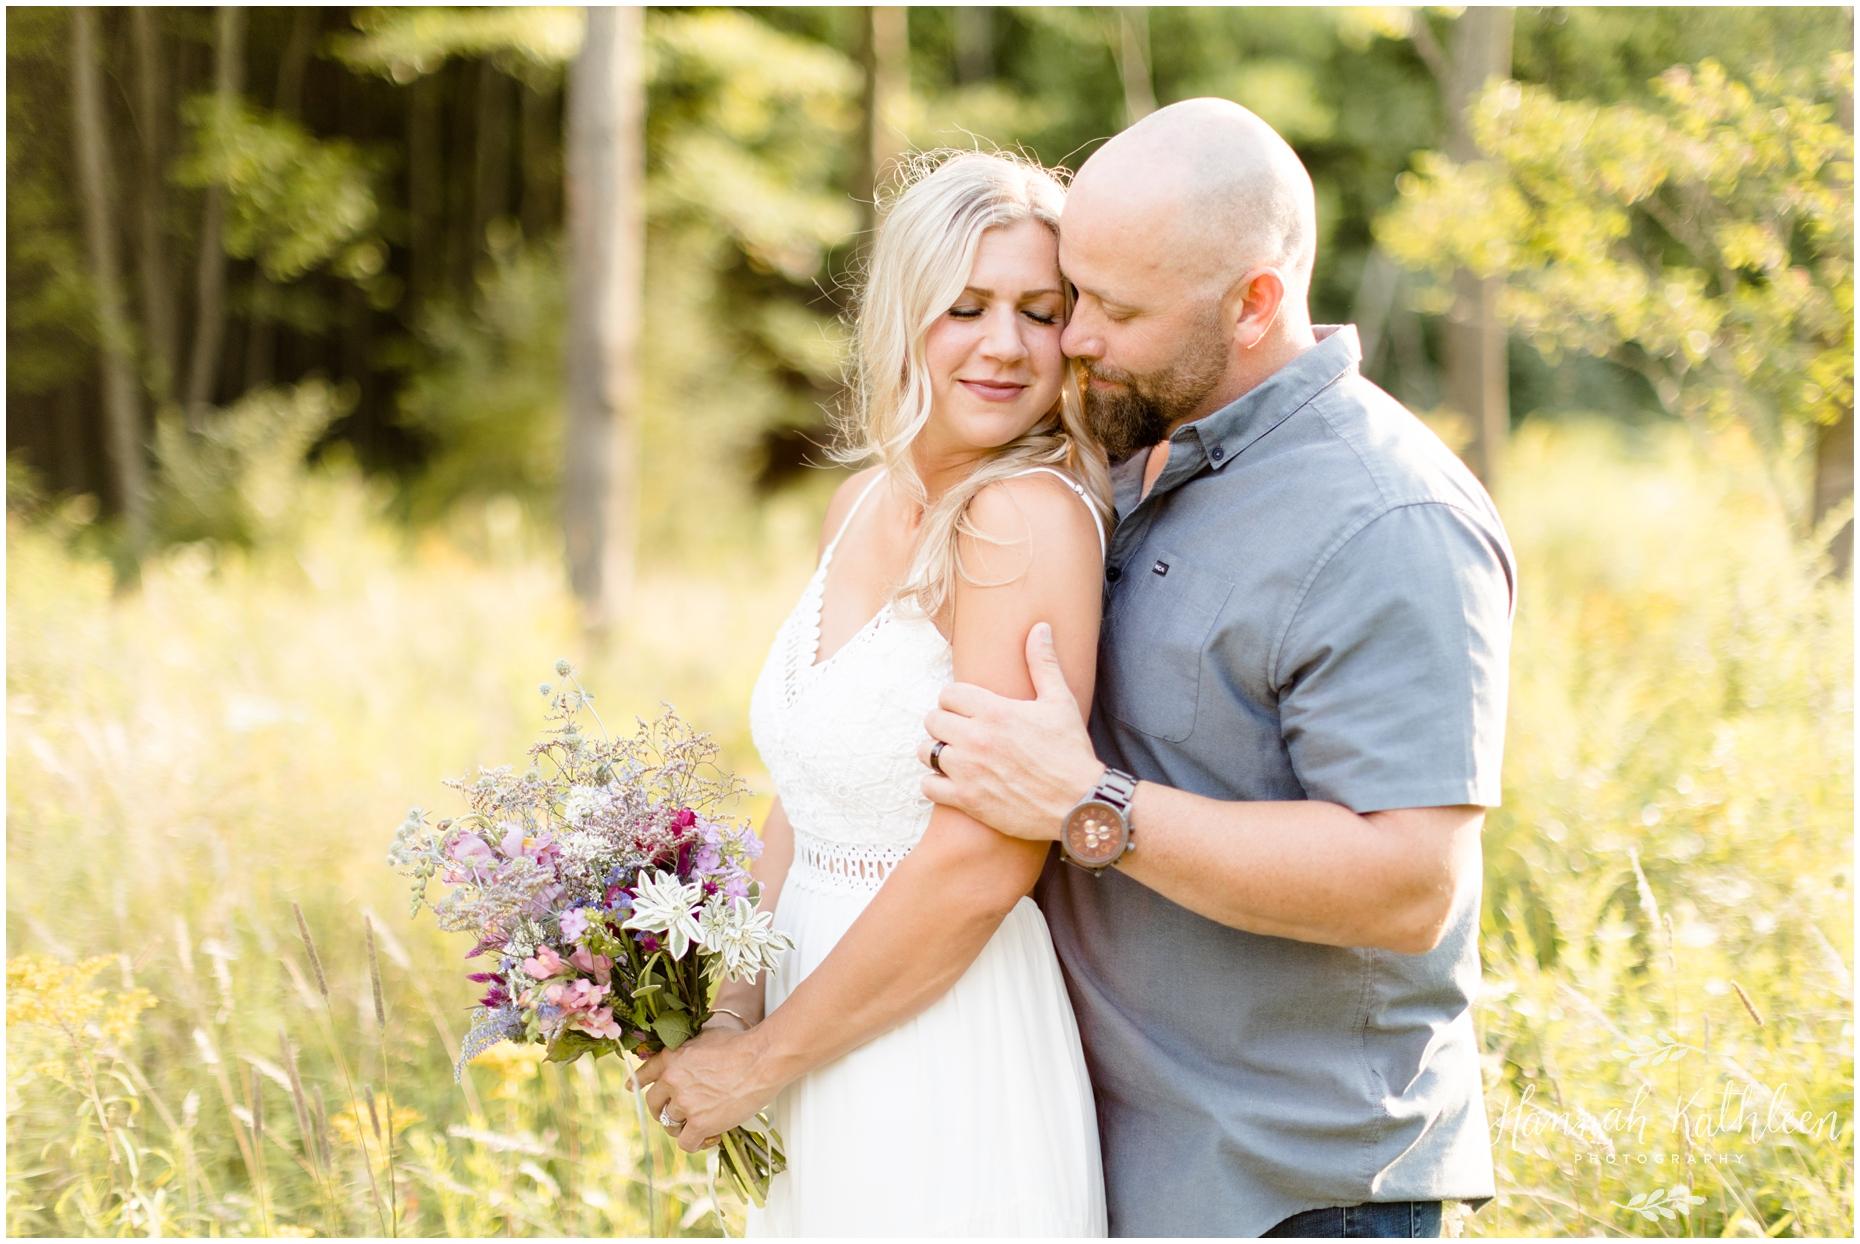 karl-alissa-small-backyard-wedding-elopement-anniversary-session-photographer